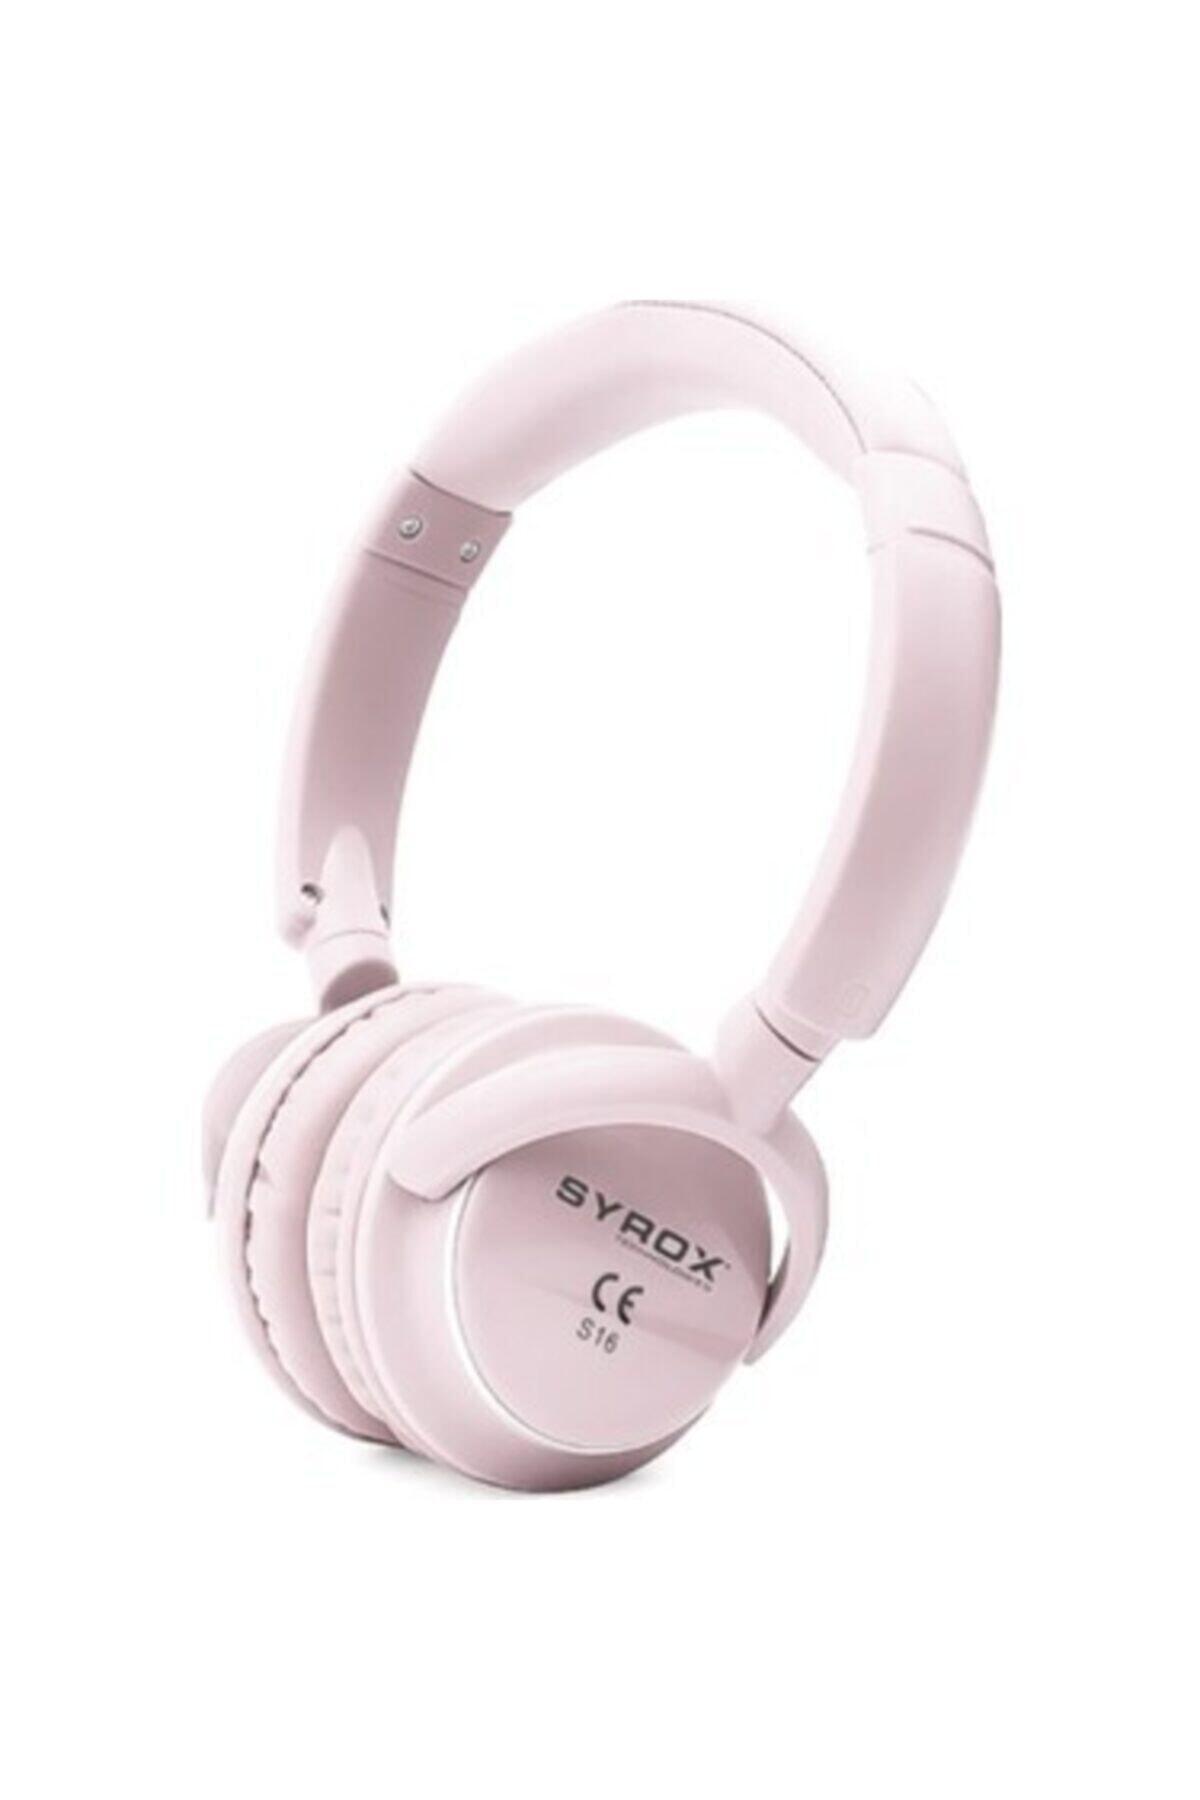 Syrox Kulaküstü Kablosuz Bluetooth Kulaklık Hafıza Kartı Girişli S16 Pembe 1